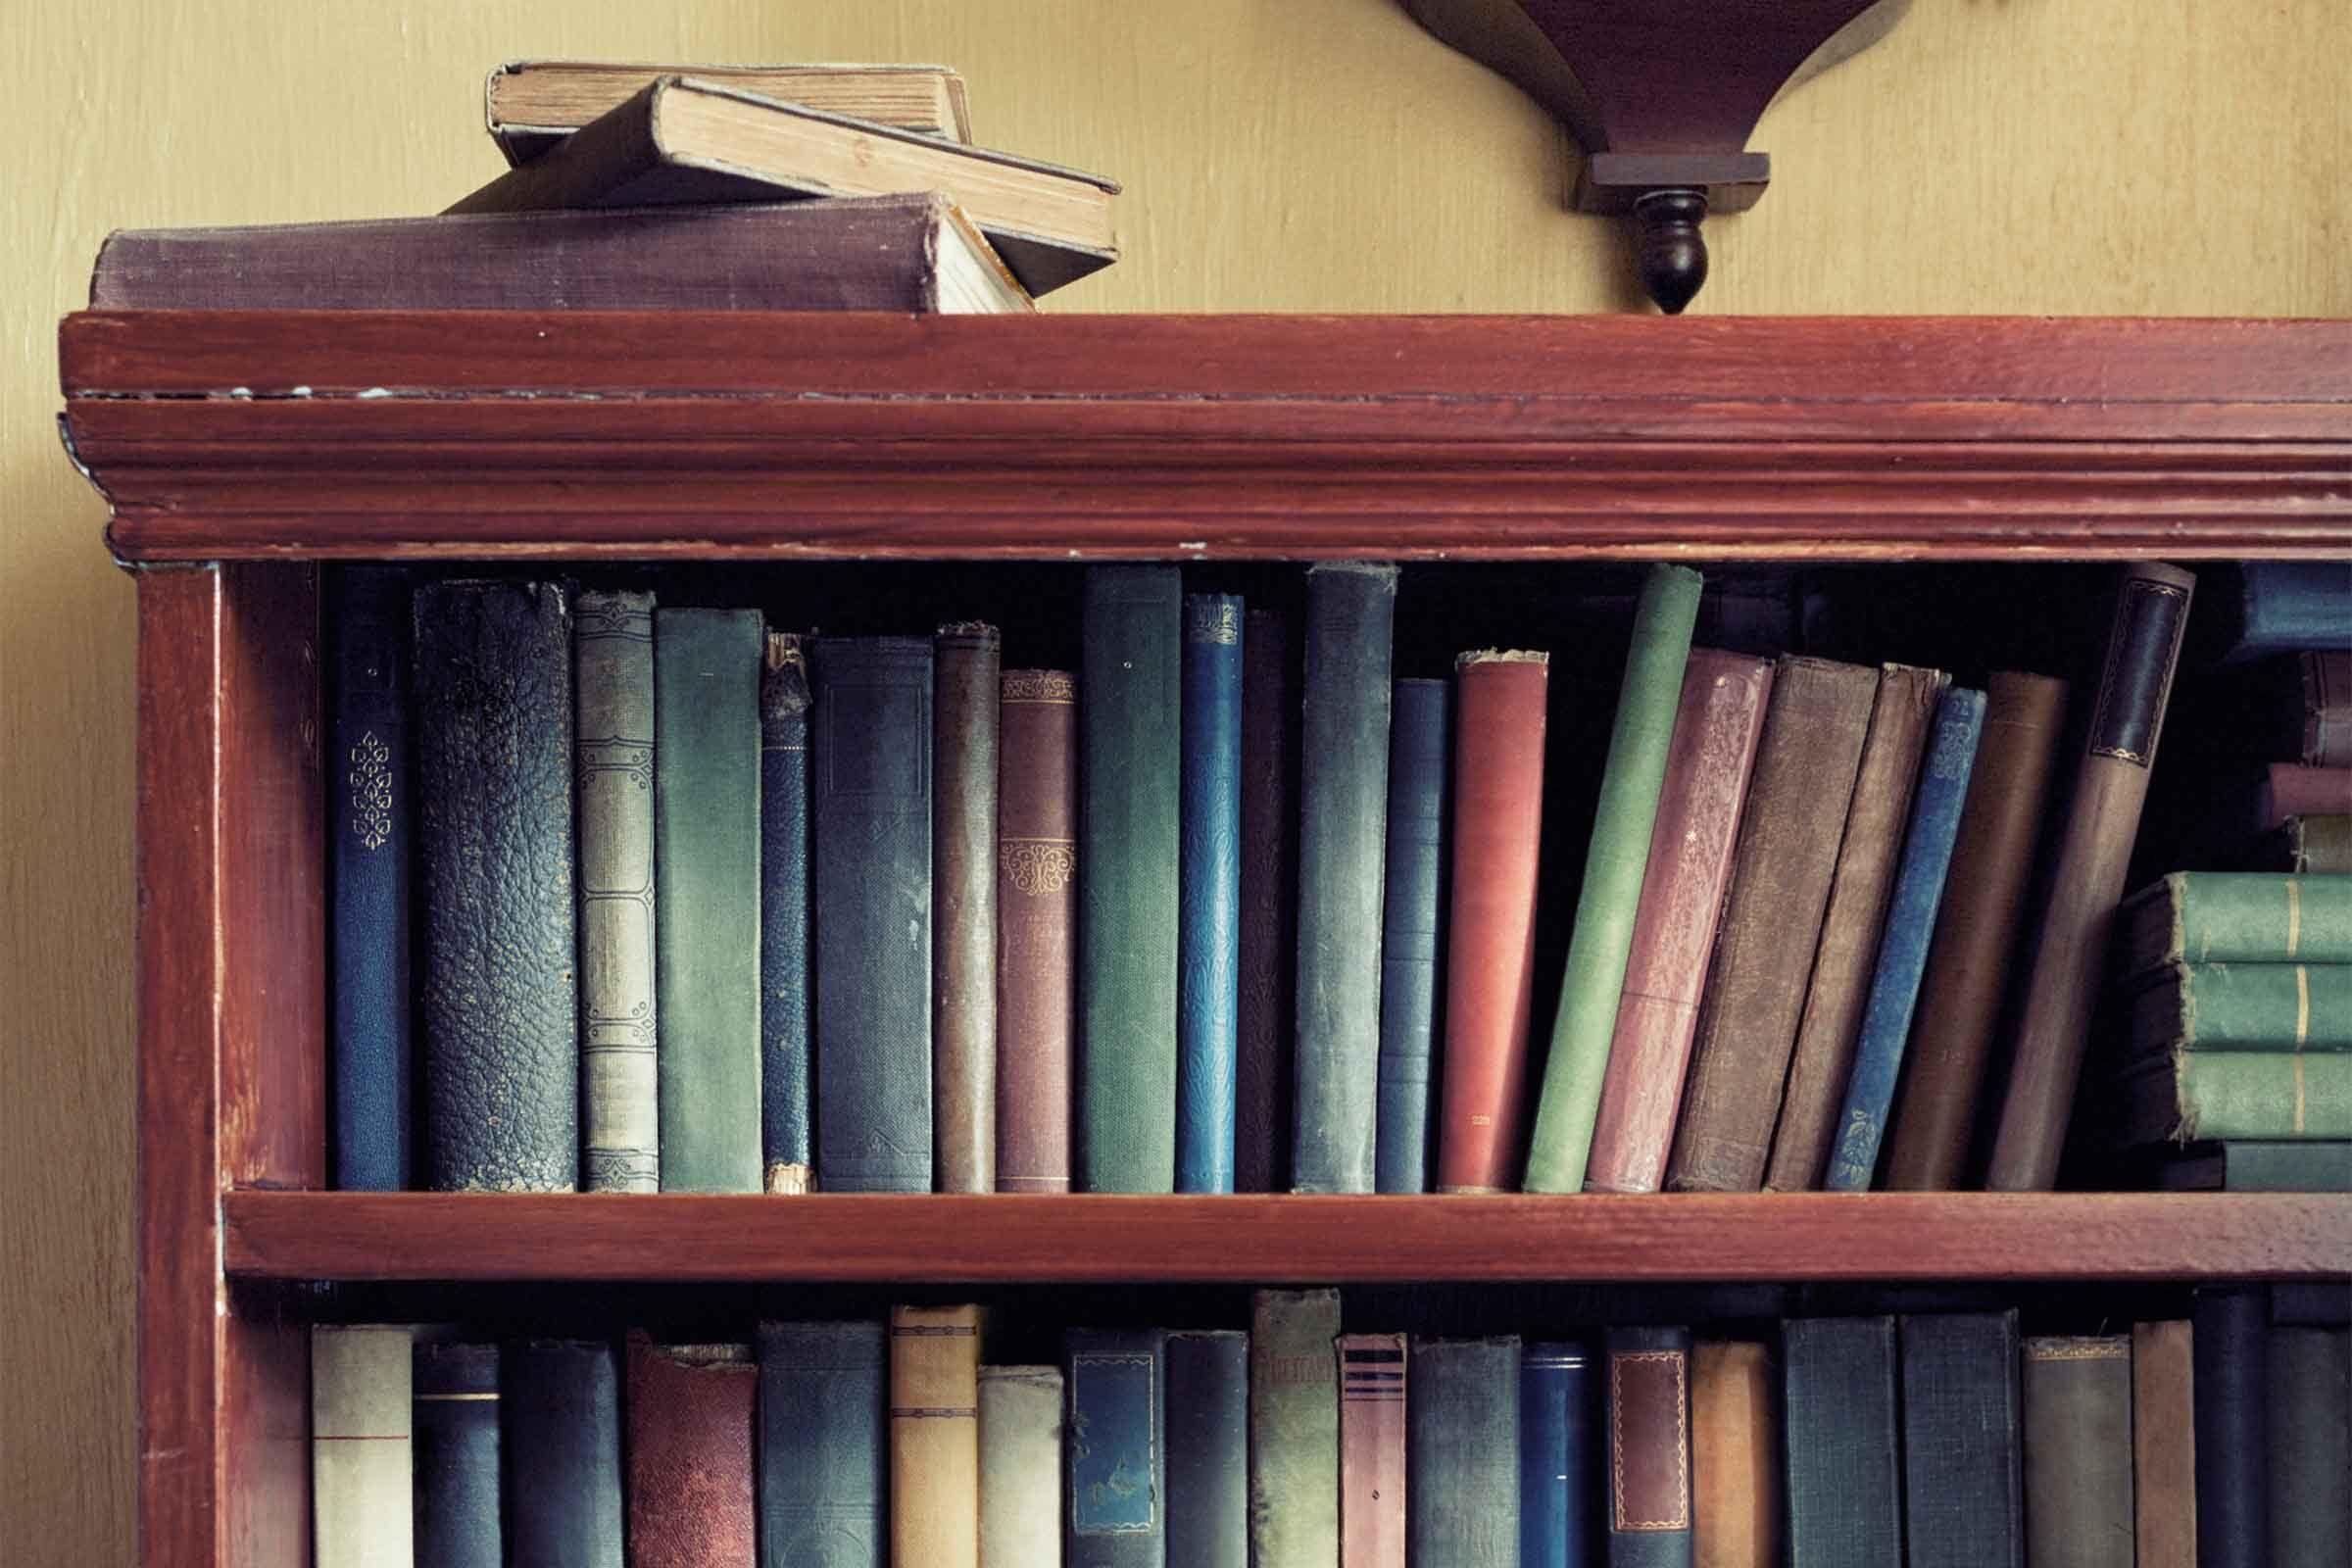 How To Decorate A Bookshelf 8 Expert Tricks Reader 39 S Digest